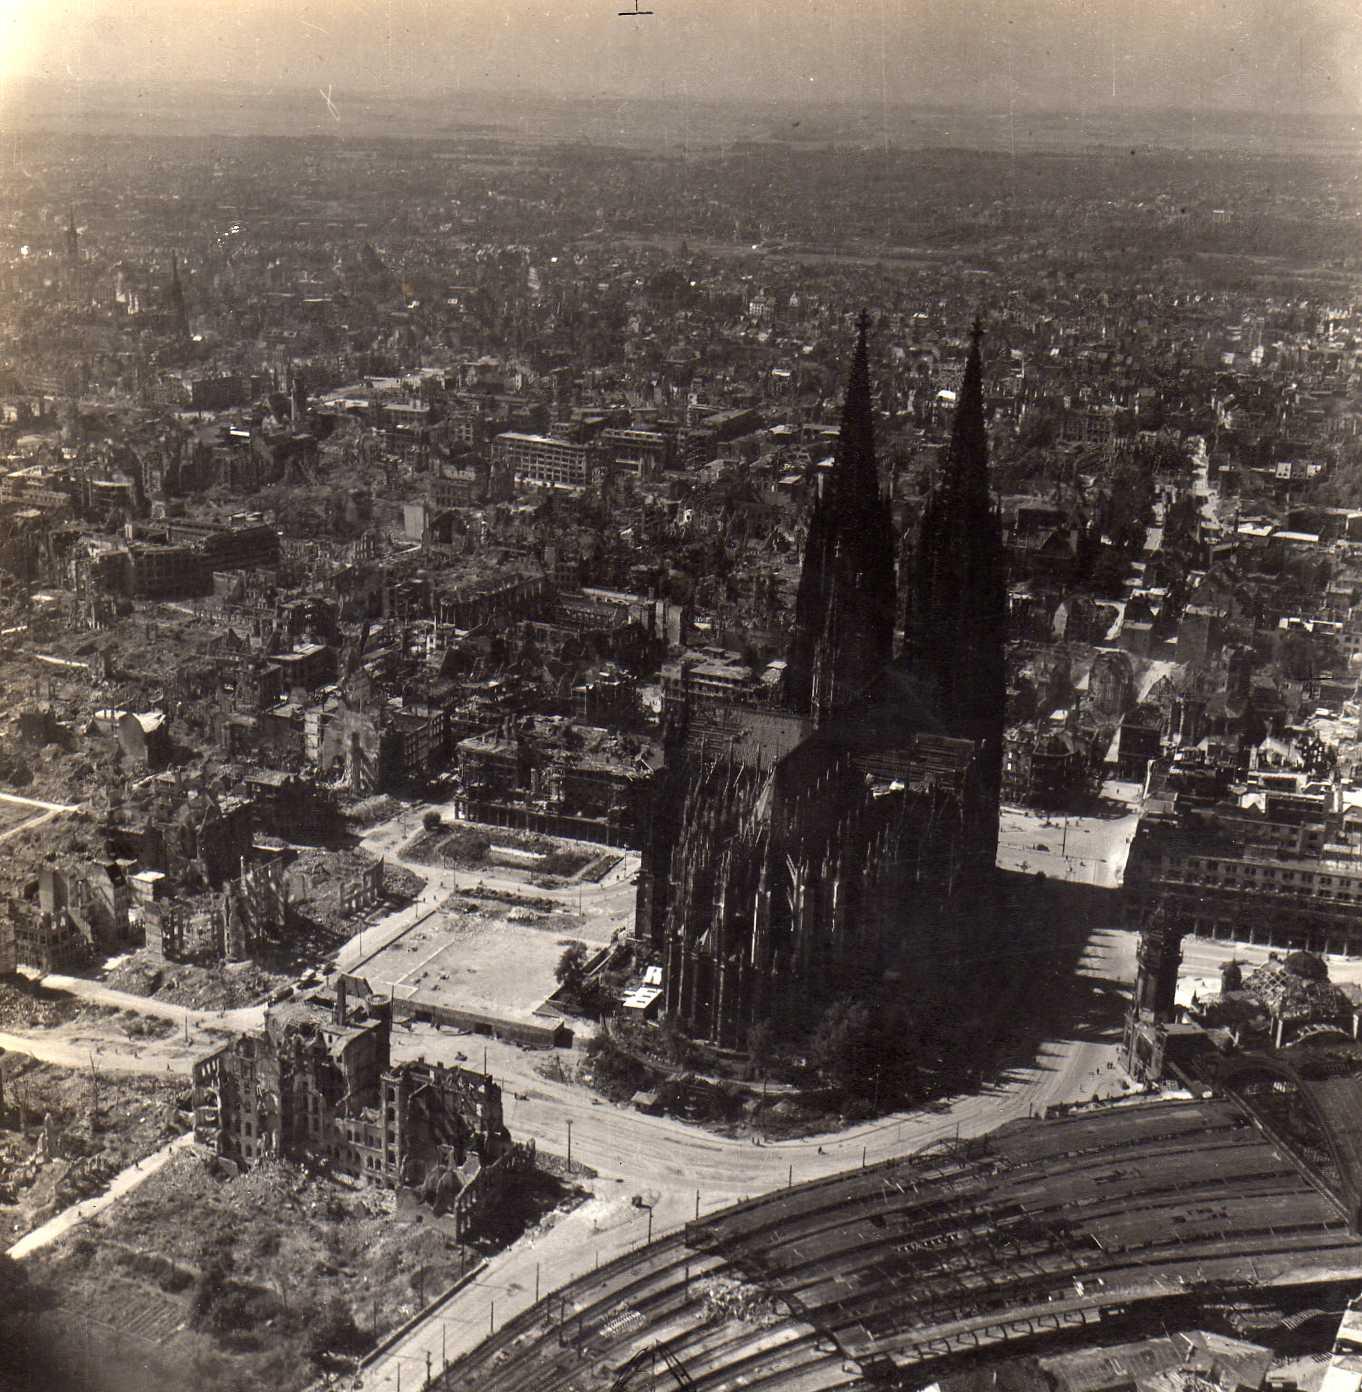 Bomb damage in Cologne